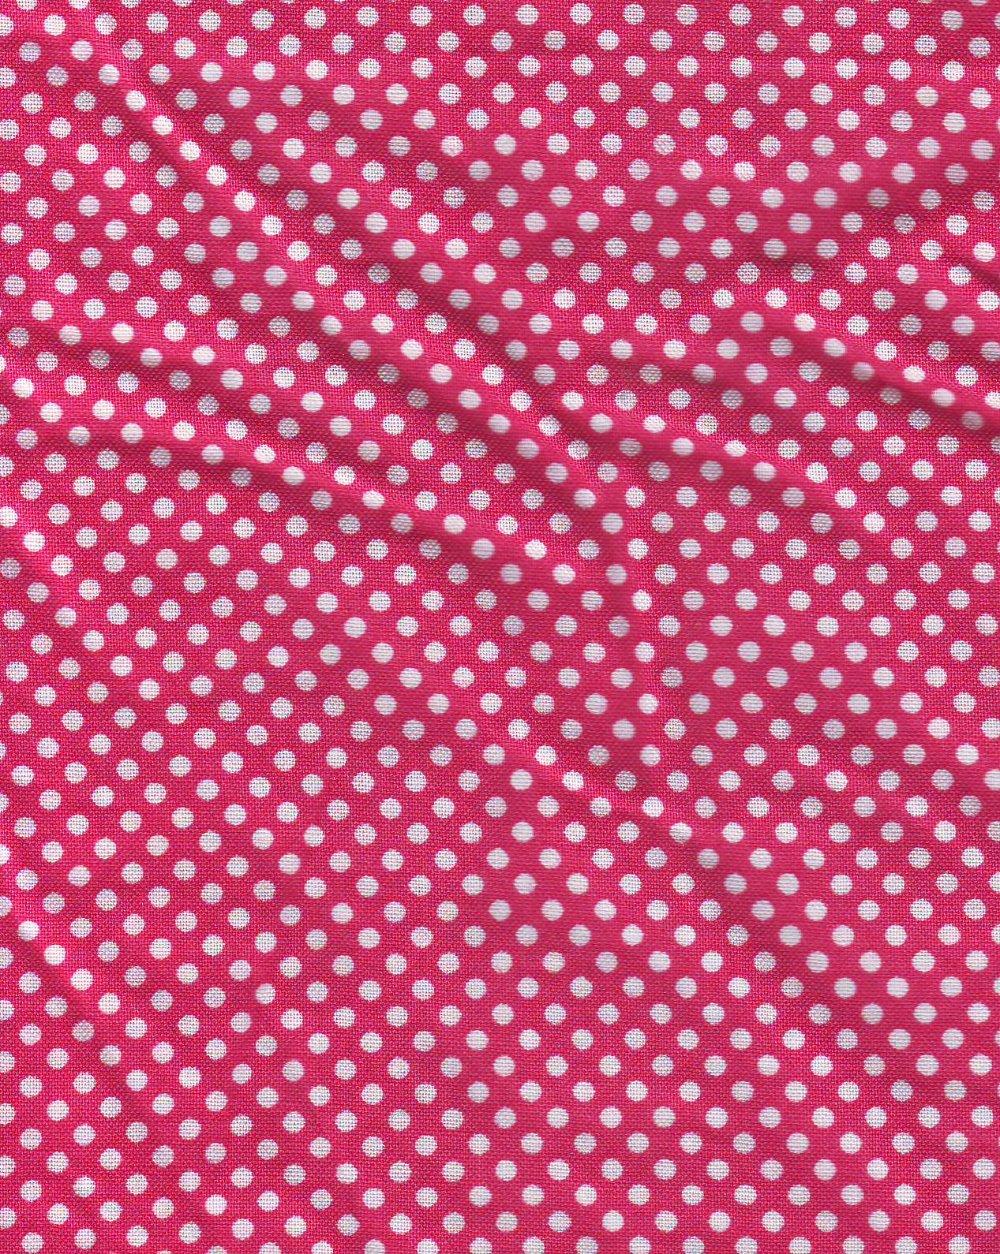 polka dot curtains.